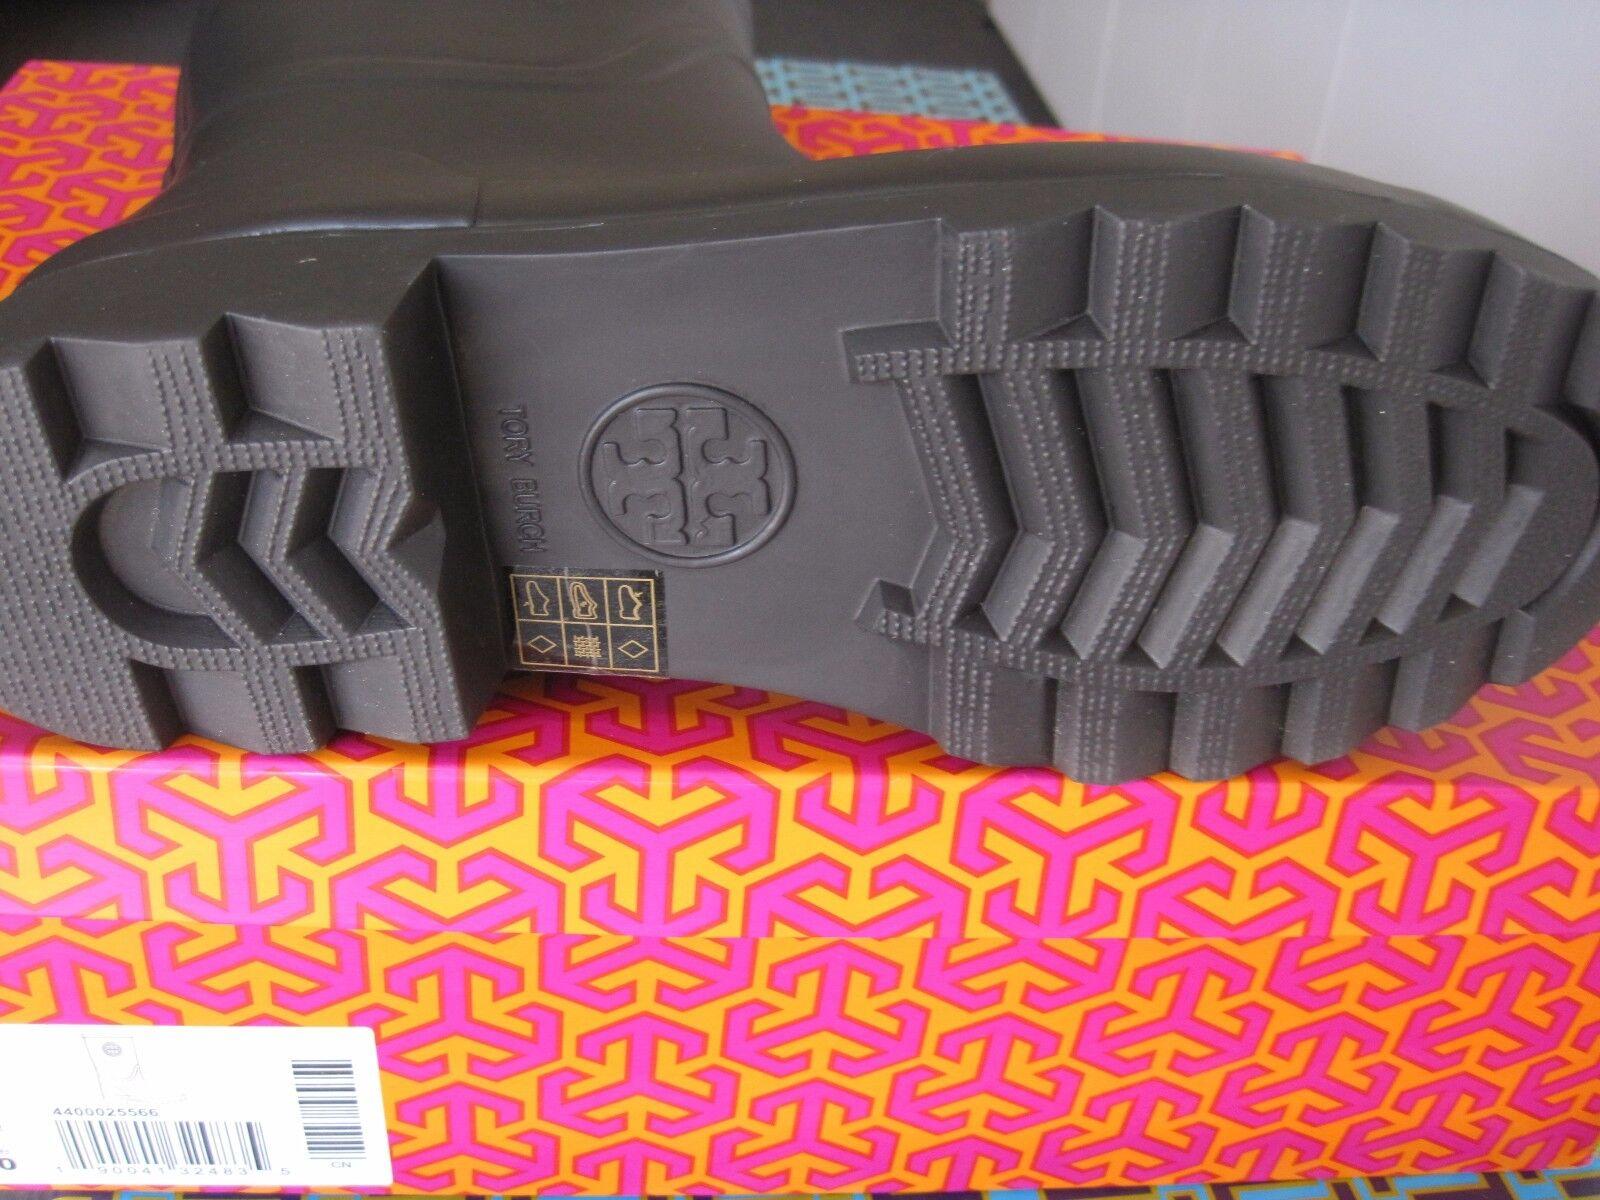 TORY BURCH MAUREEN RAIN BOOT NAVY  NEW BRAND NEW  IN THE BOX SIZE 10 52b8a5